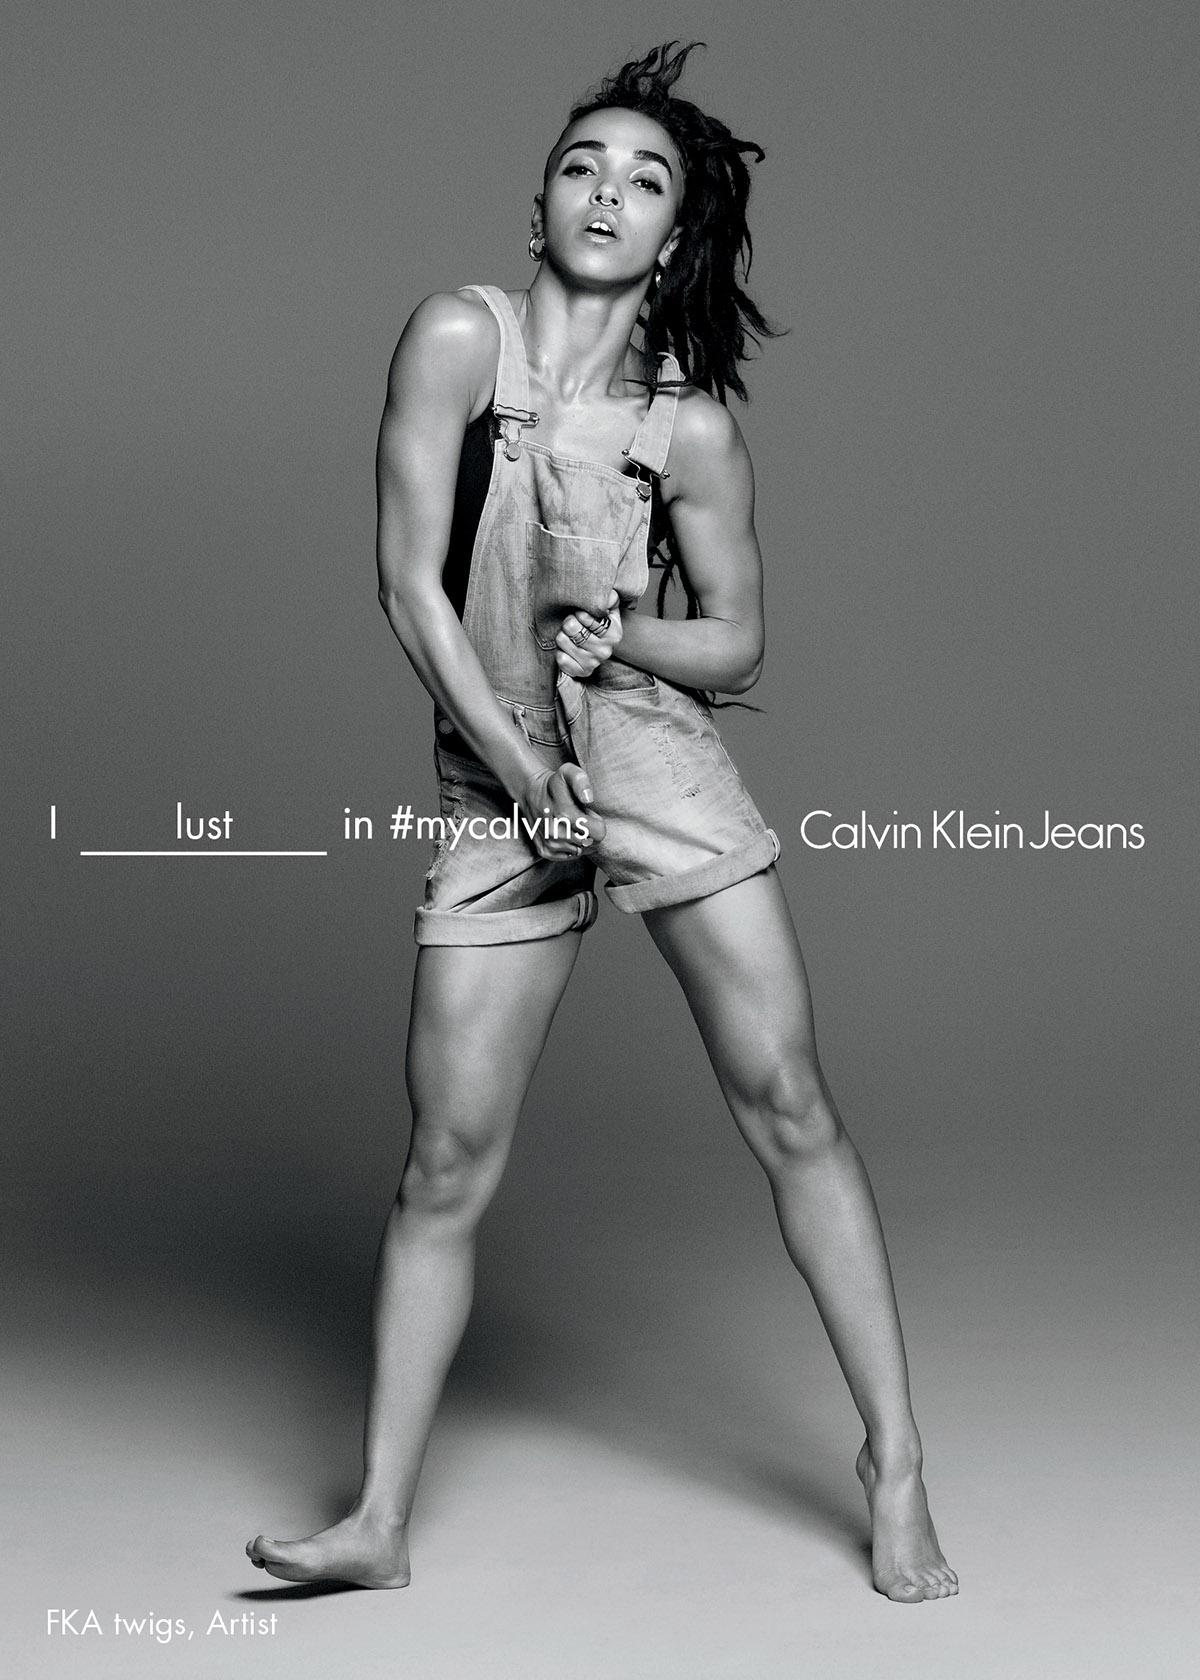 calvin-klein-jeans-s16-campaign_ph_david-sims-016